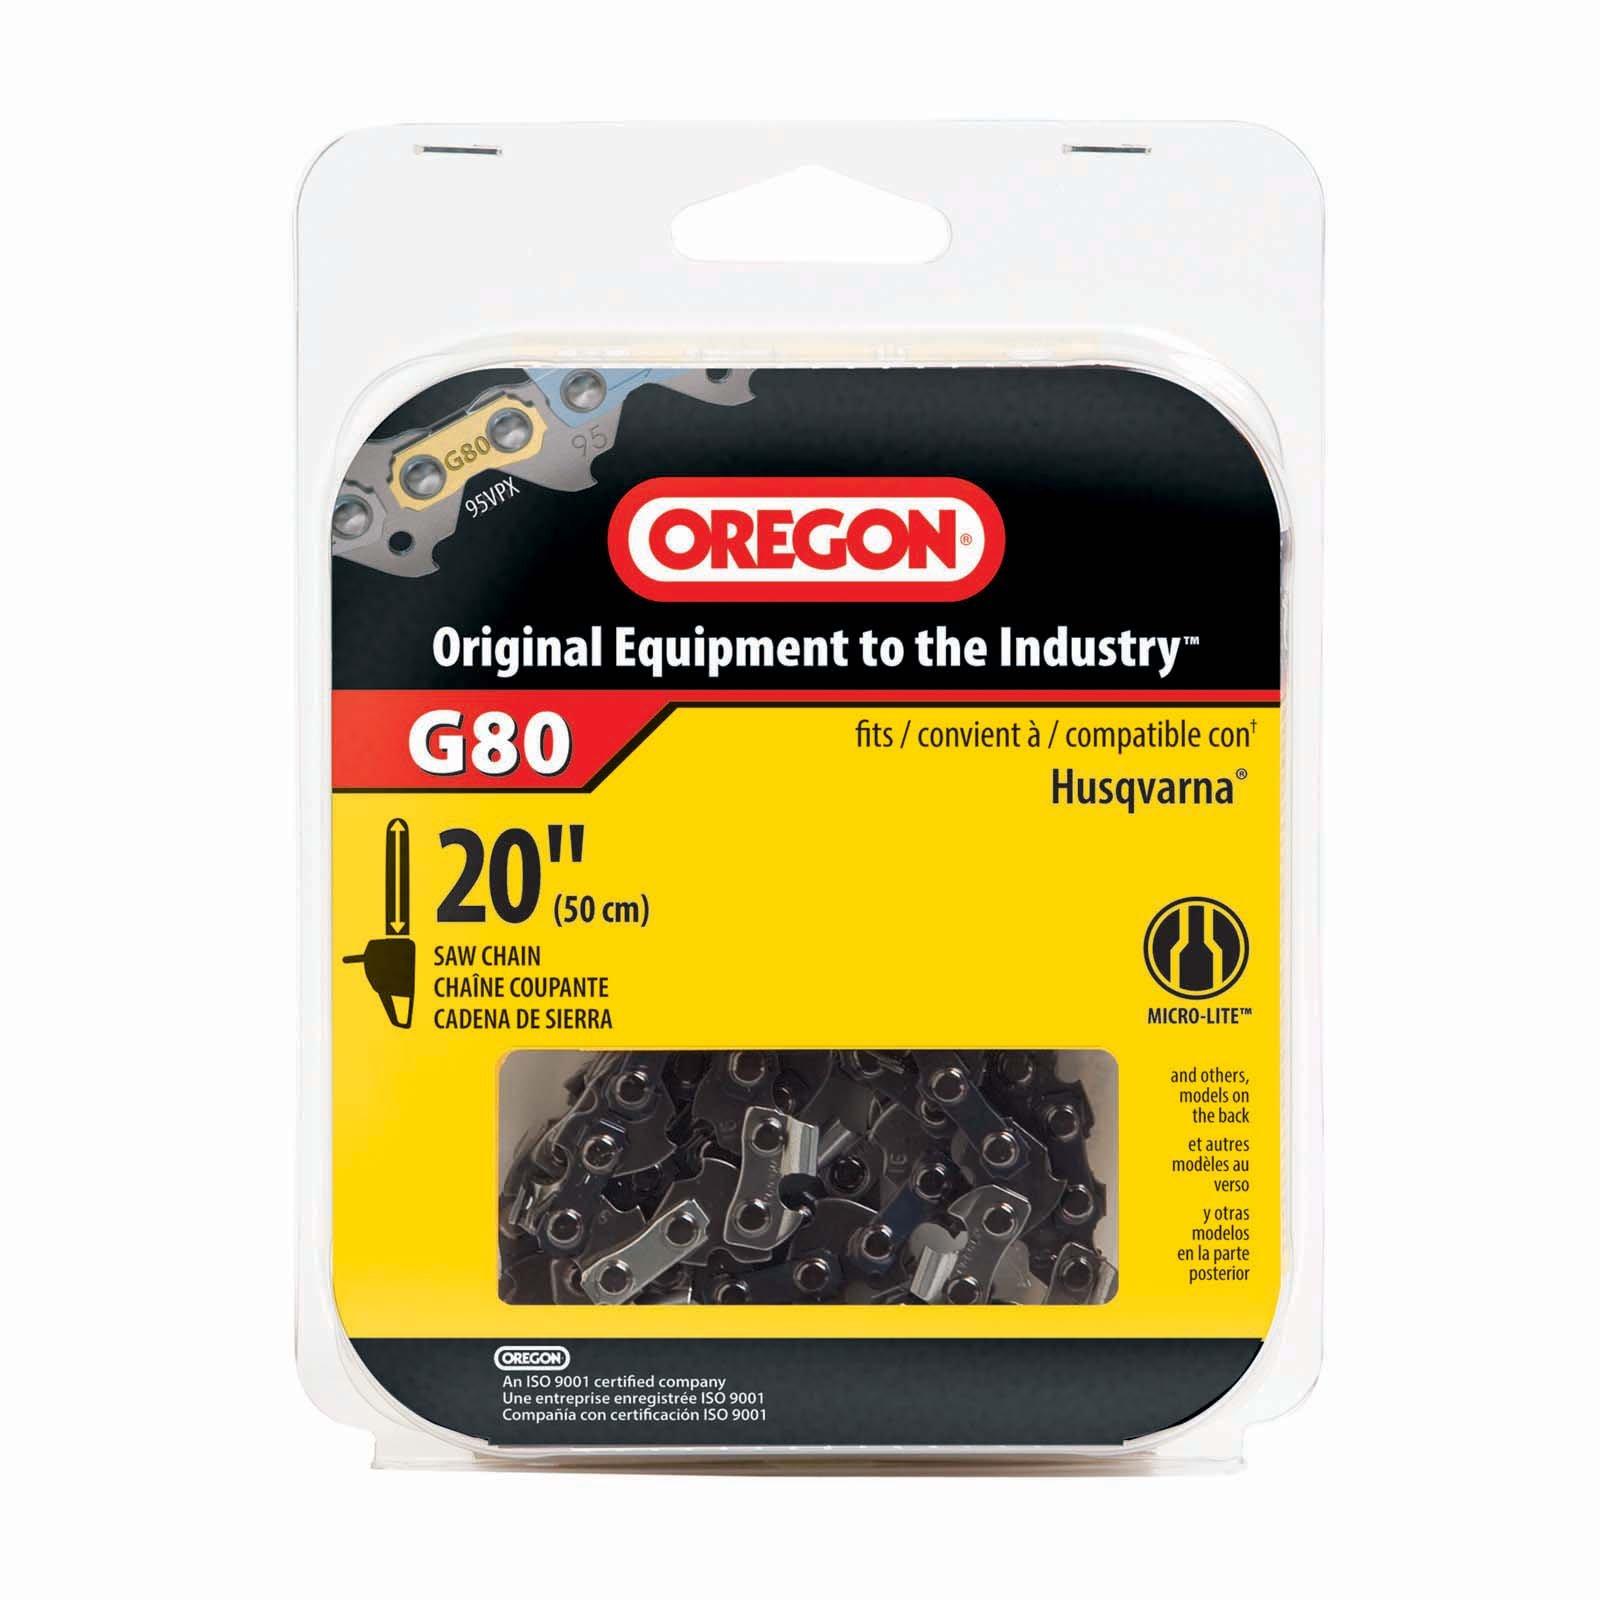 Oregon G80 SpeedCut 20-Inch Chainsaw Chain, Fits Husqvarna